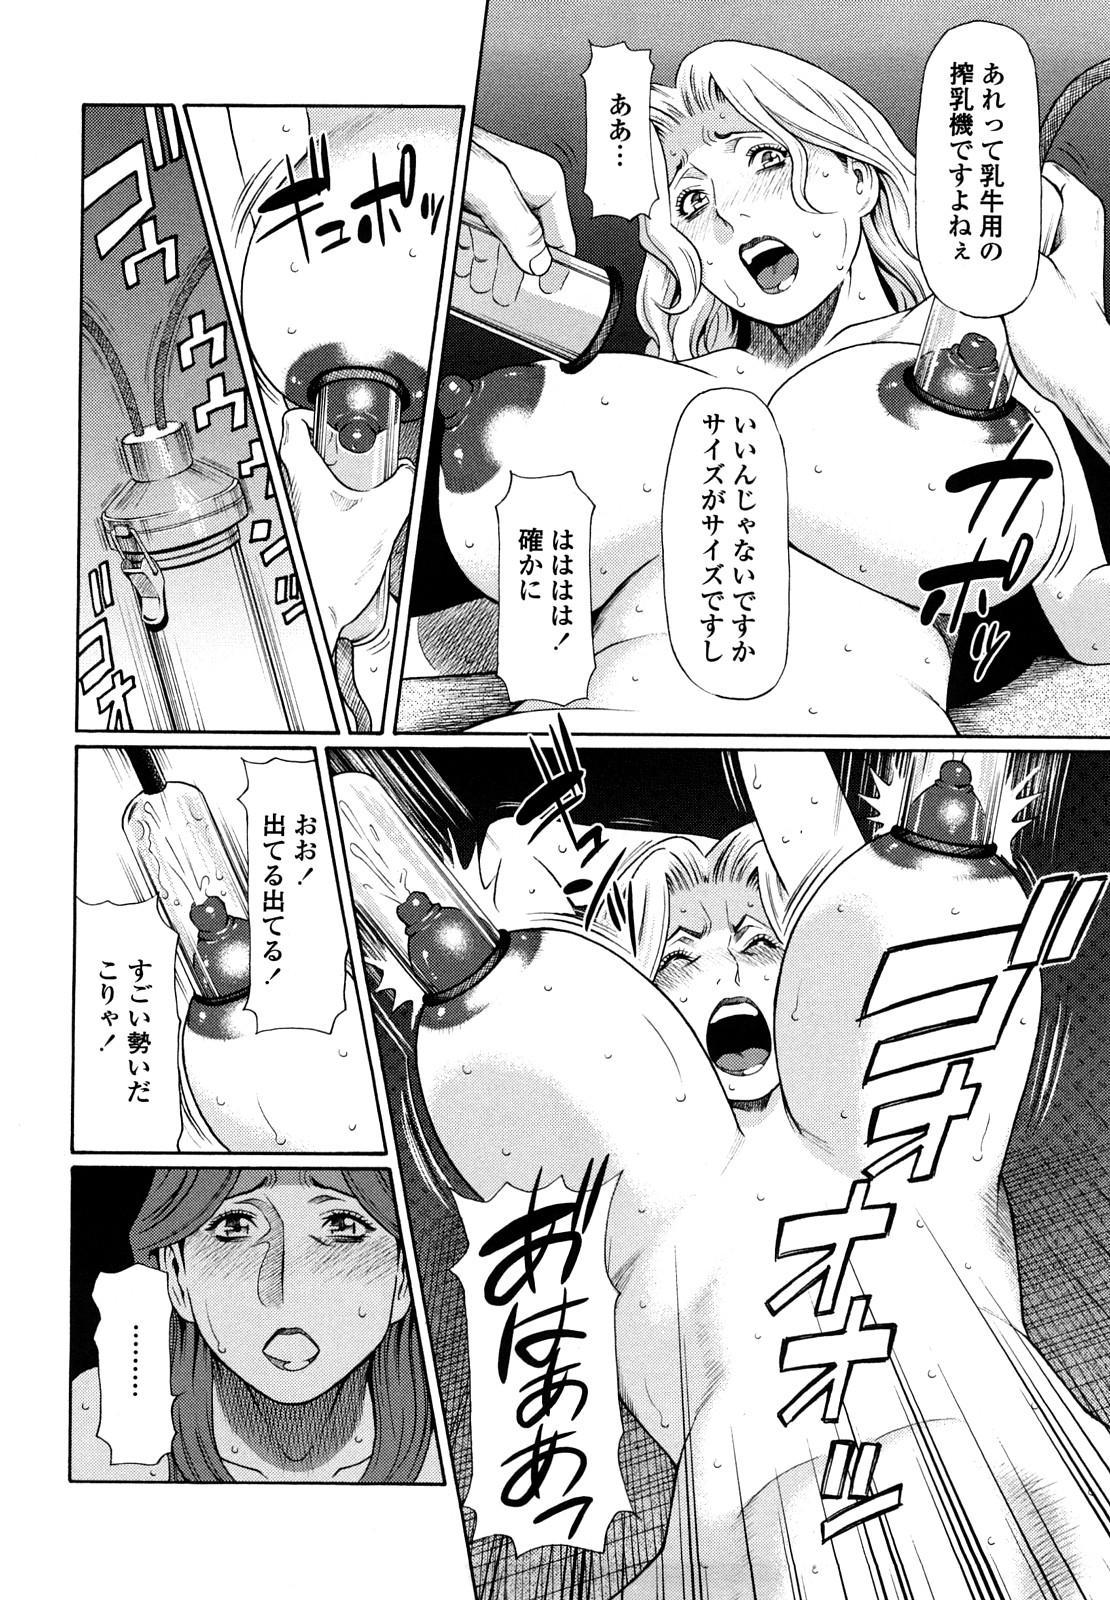 [Takasugi Kou] Kindan no Haha-Ana - Immorality Love-Hole [Decensored] 111